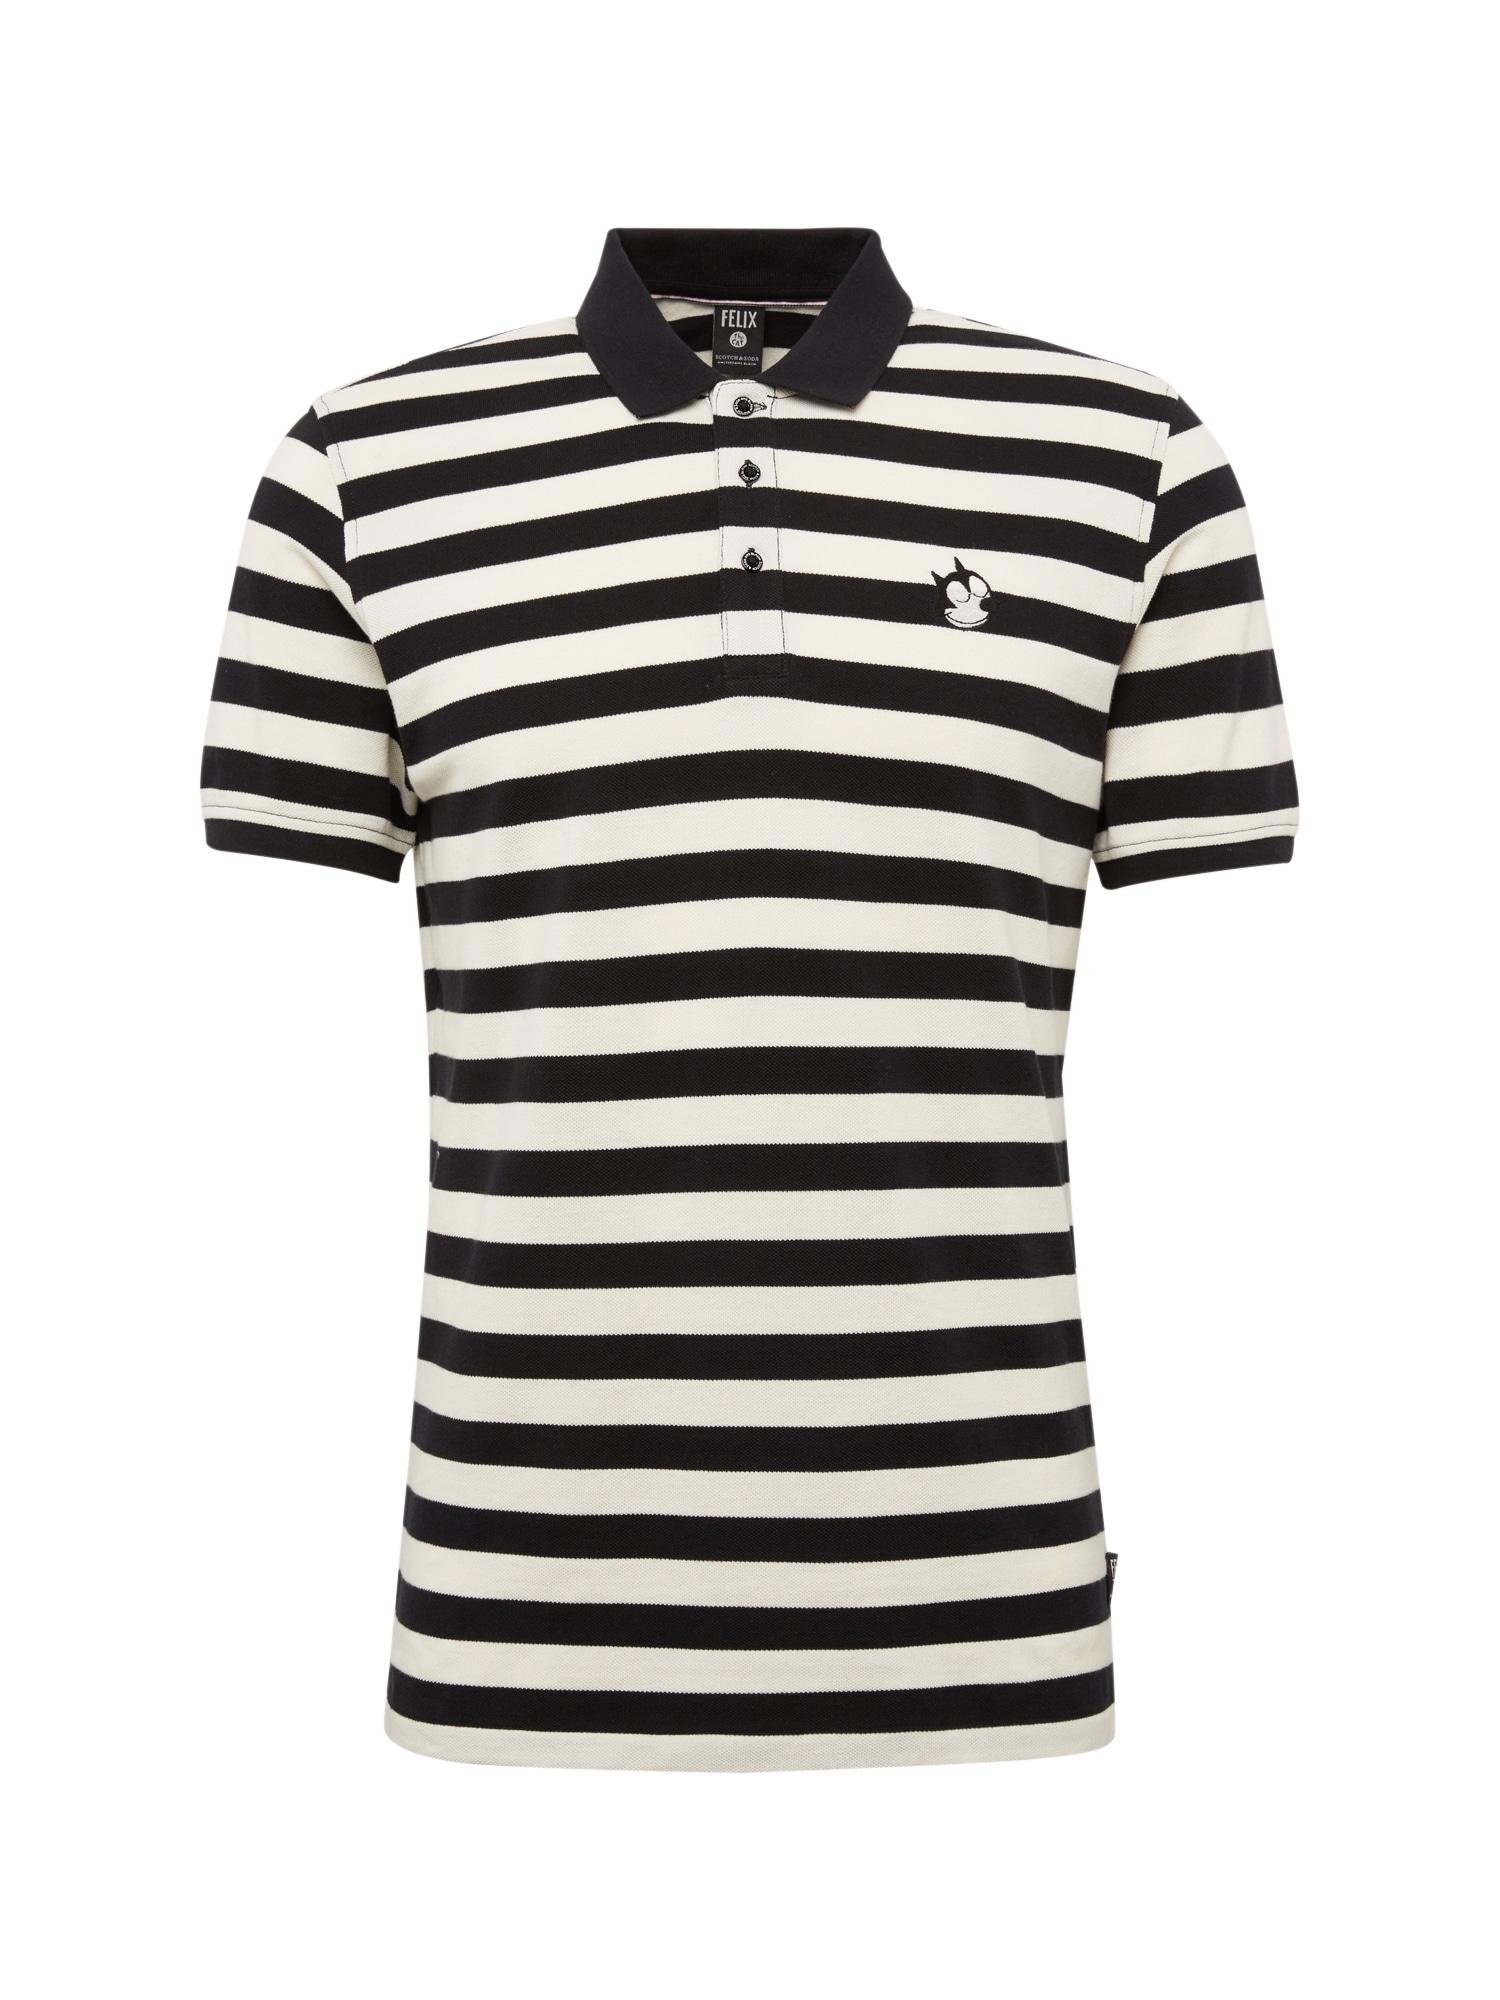 SCOTCH  and  SODA Heren Shirt Felix Ams Blauw colab polo in bold stripe zwart